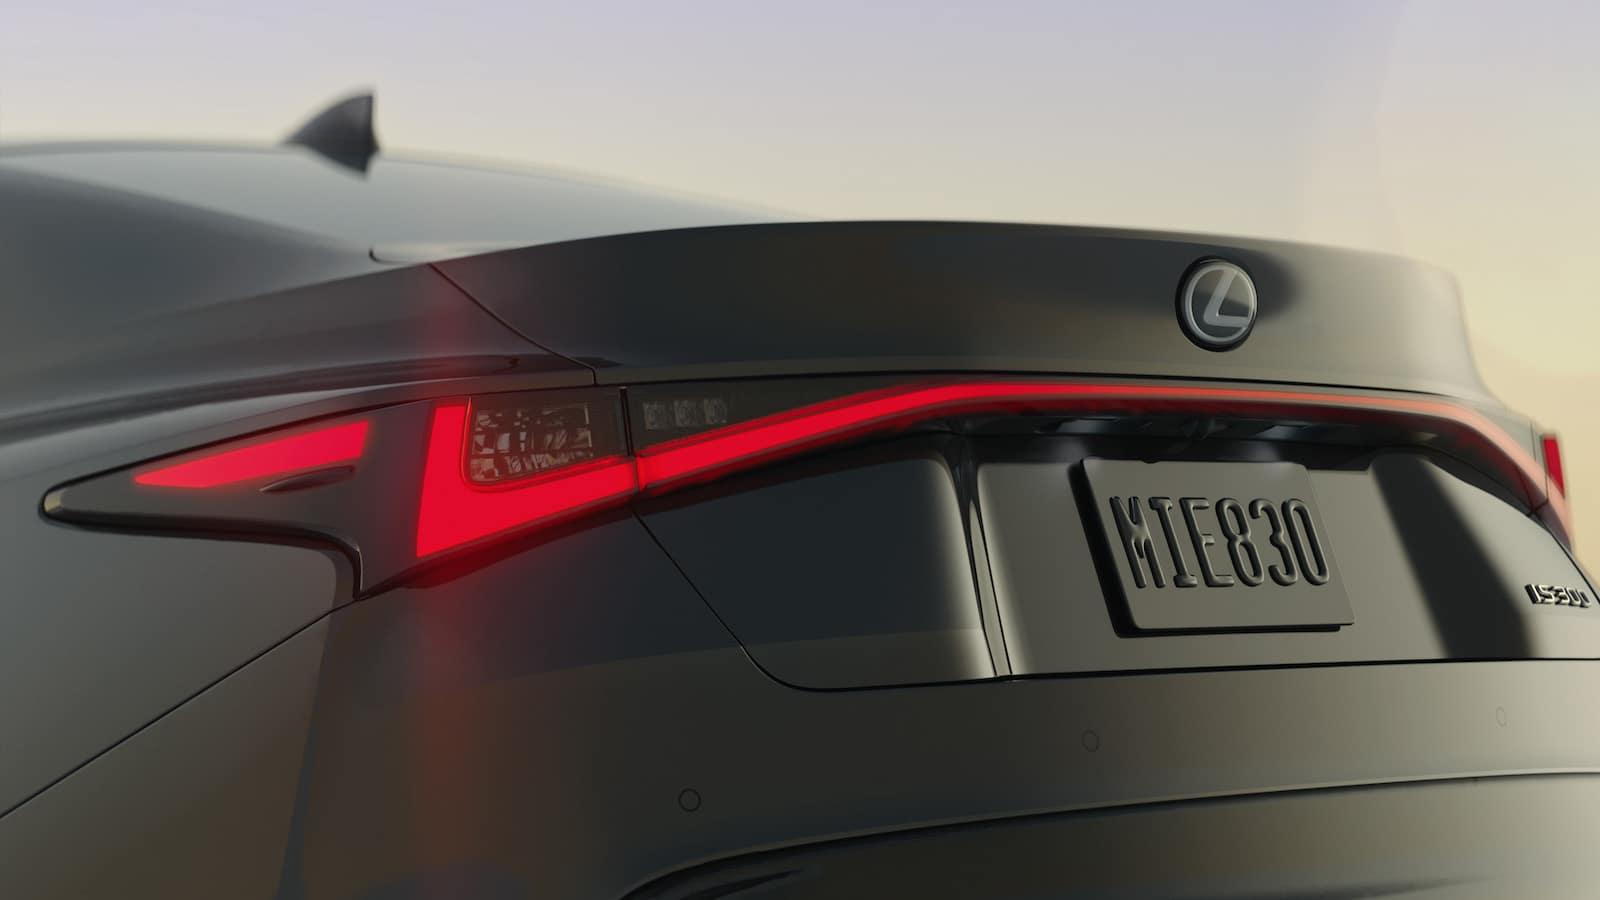 Lexus IS300 tail lights Lexus of Las Vegas